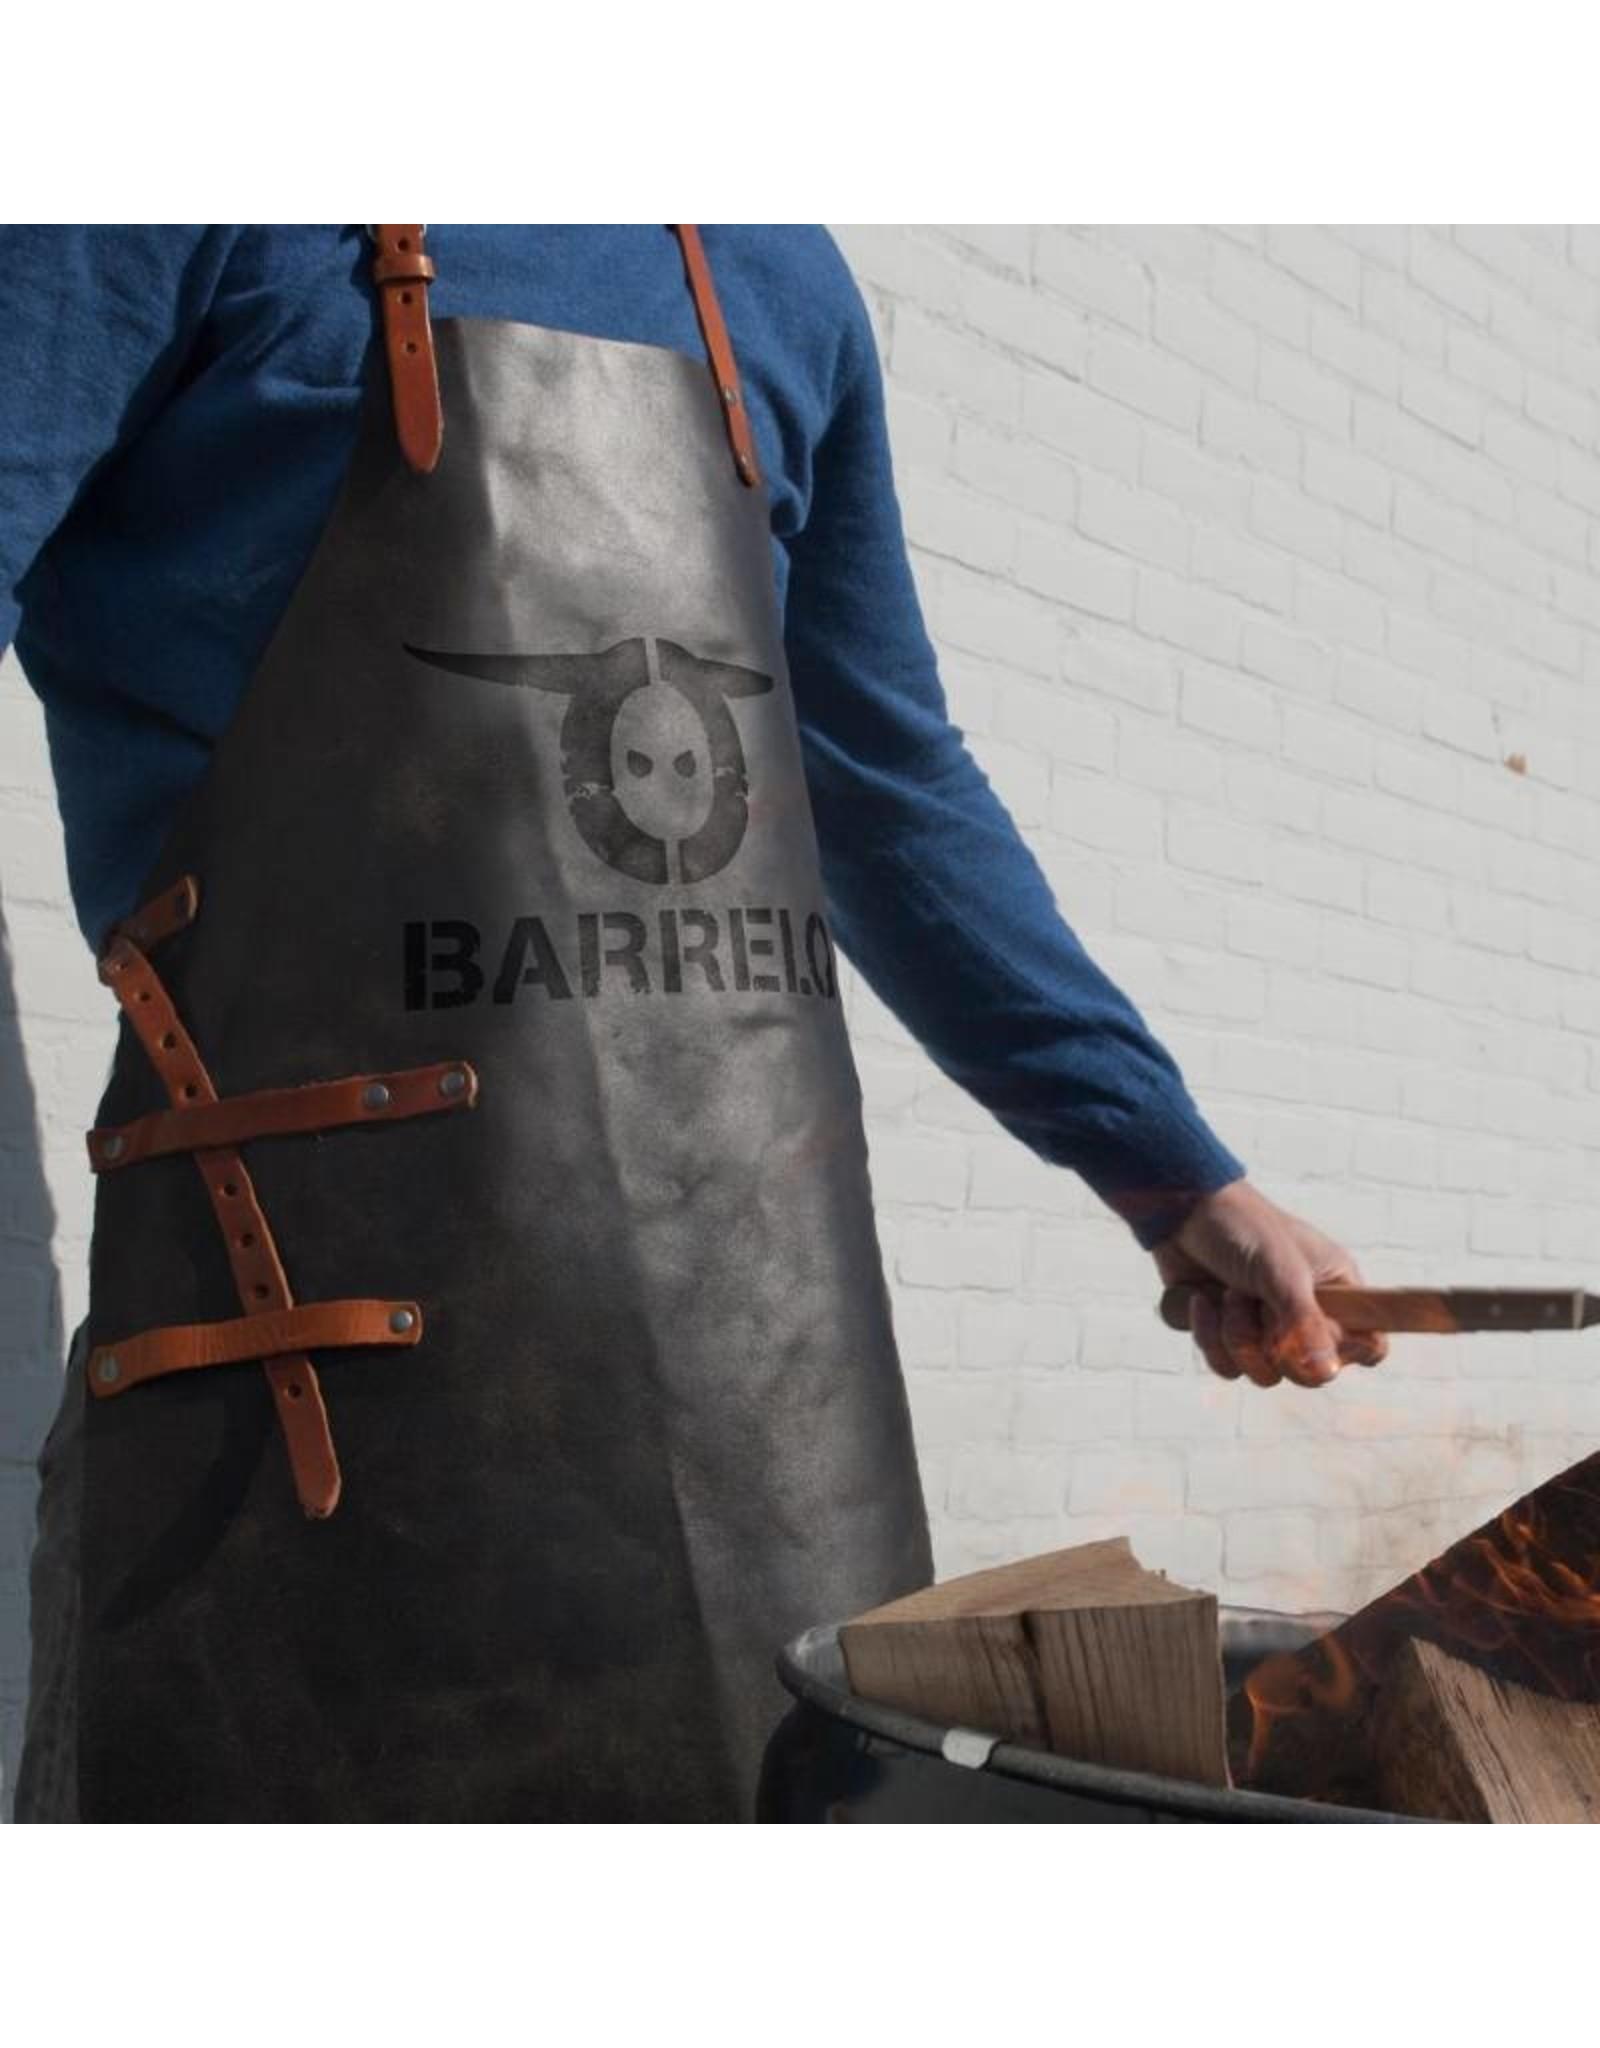 BarrelQ BarrelQ BarrelQ Leather Apron